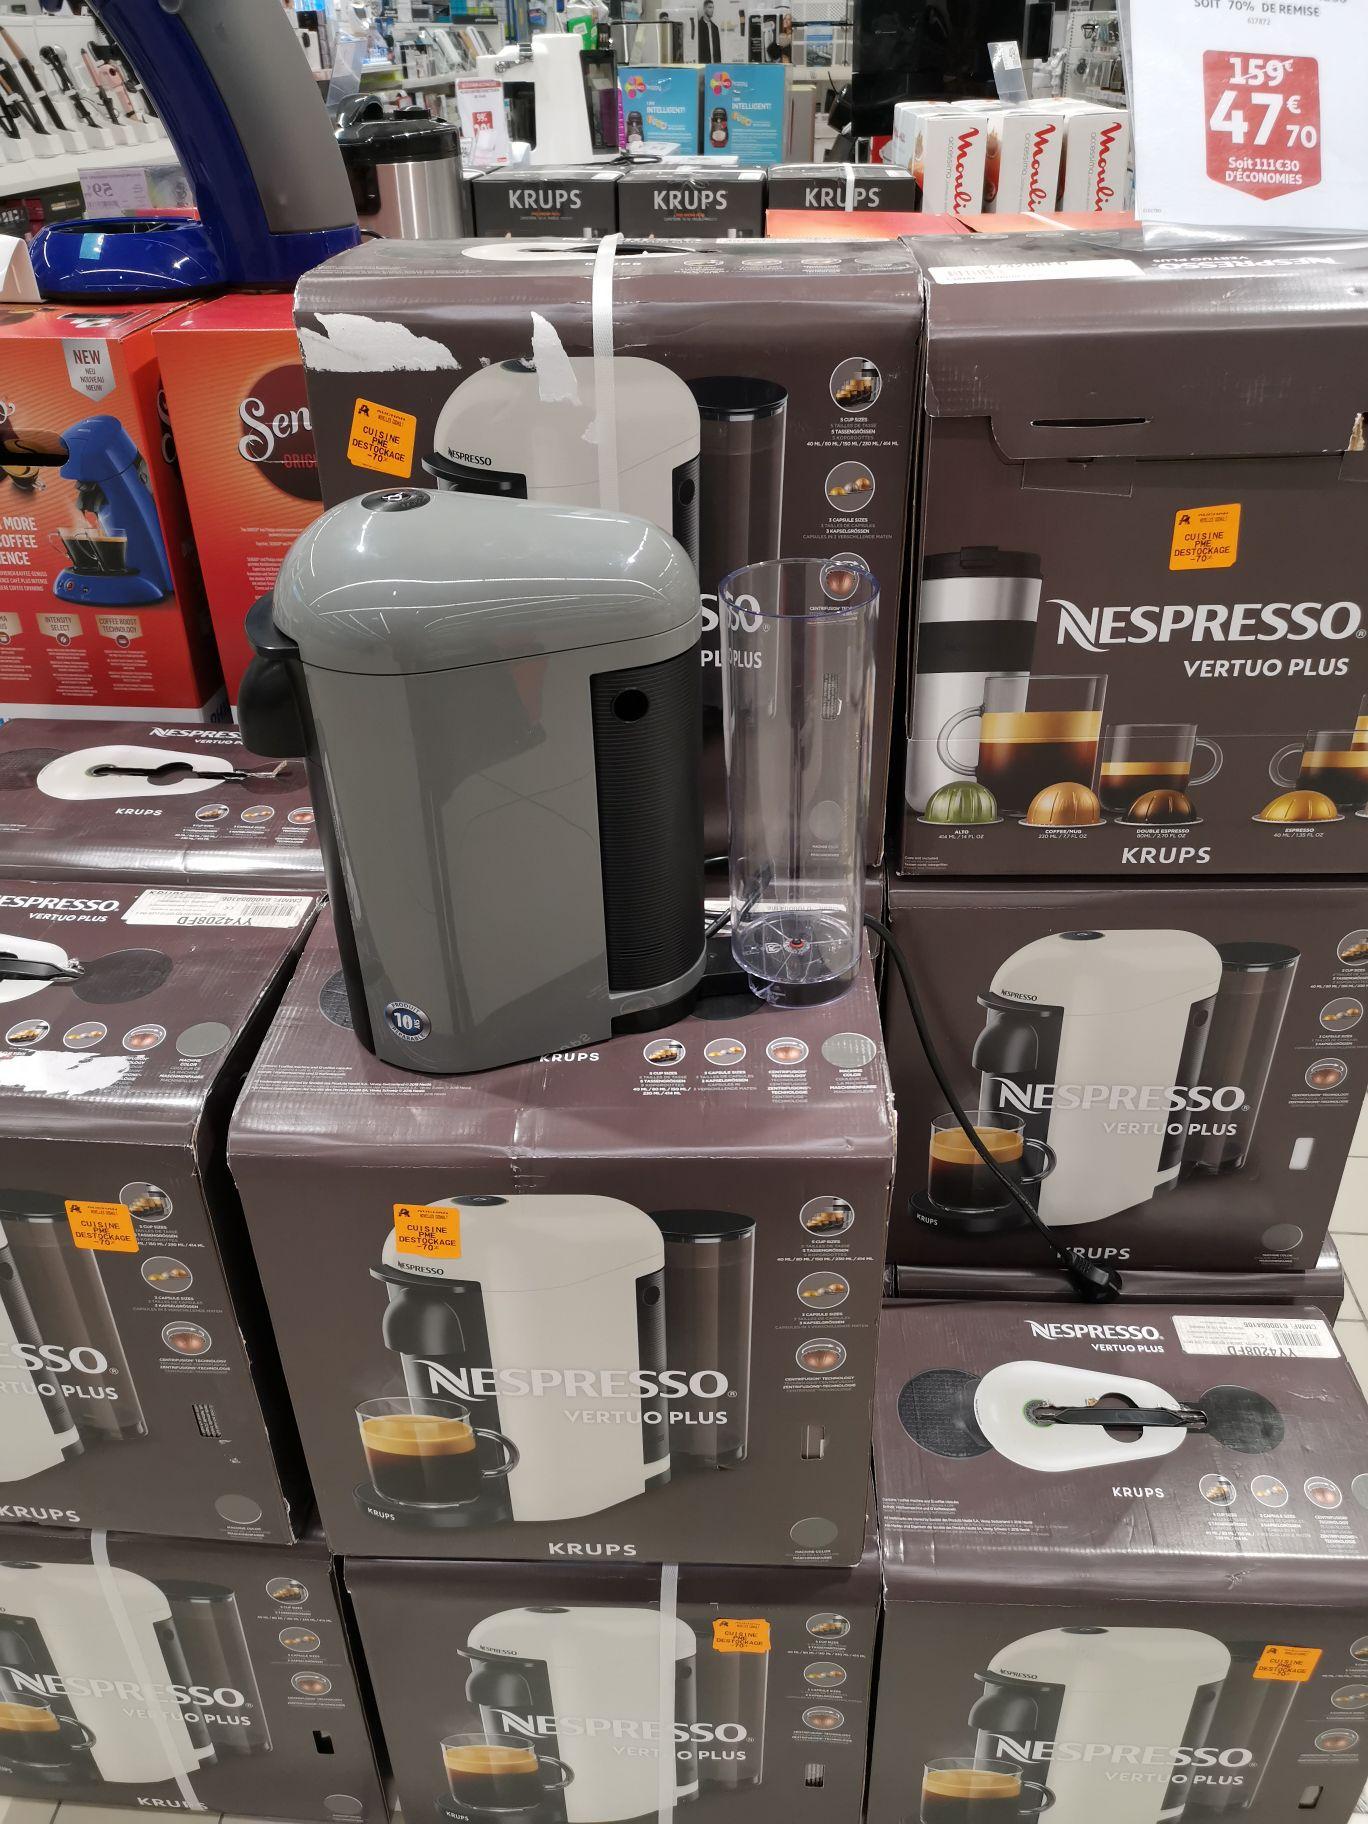 Machine à café Krups Nespresso YY4208 - Auchan noyelles Godault (62)